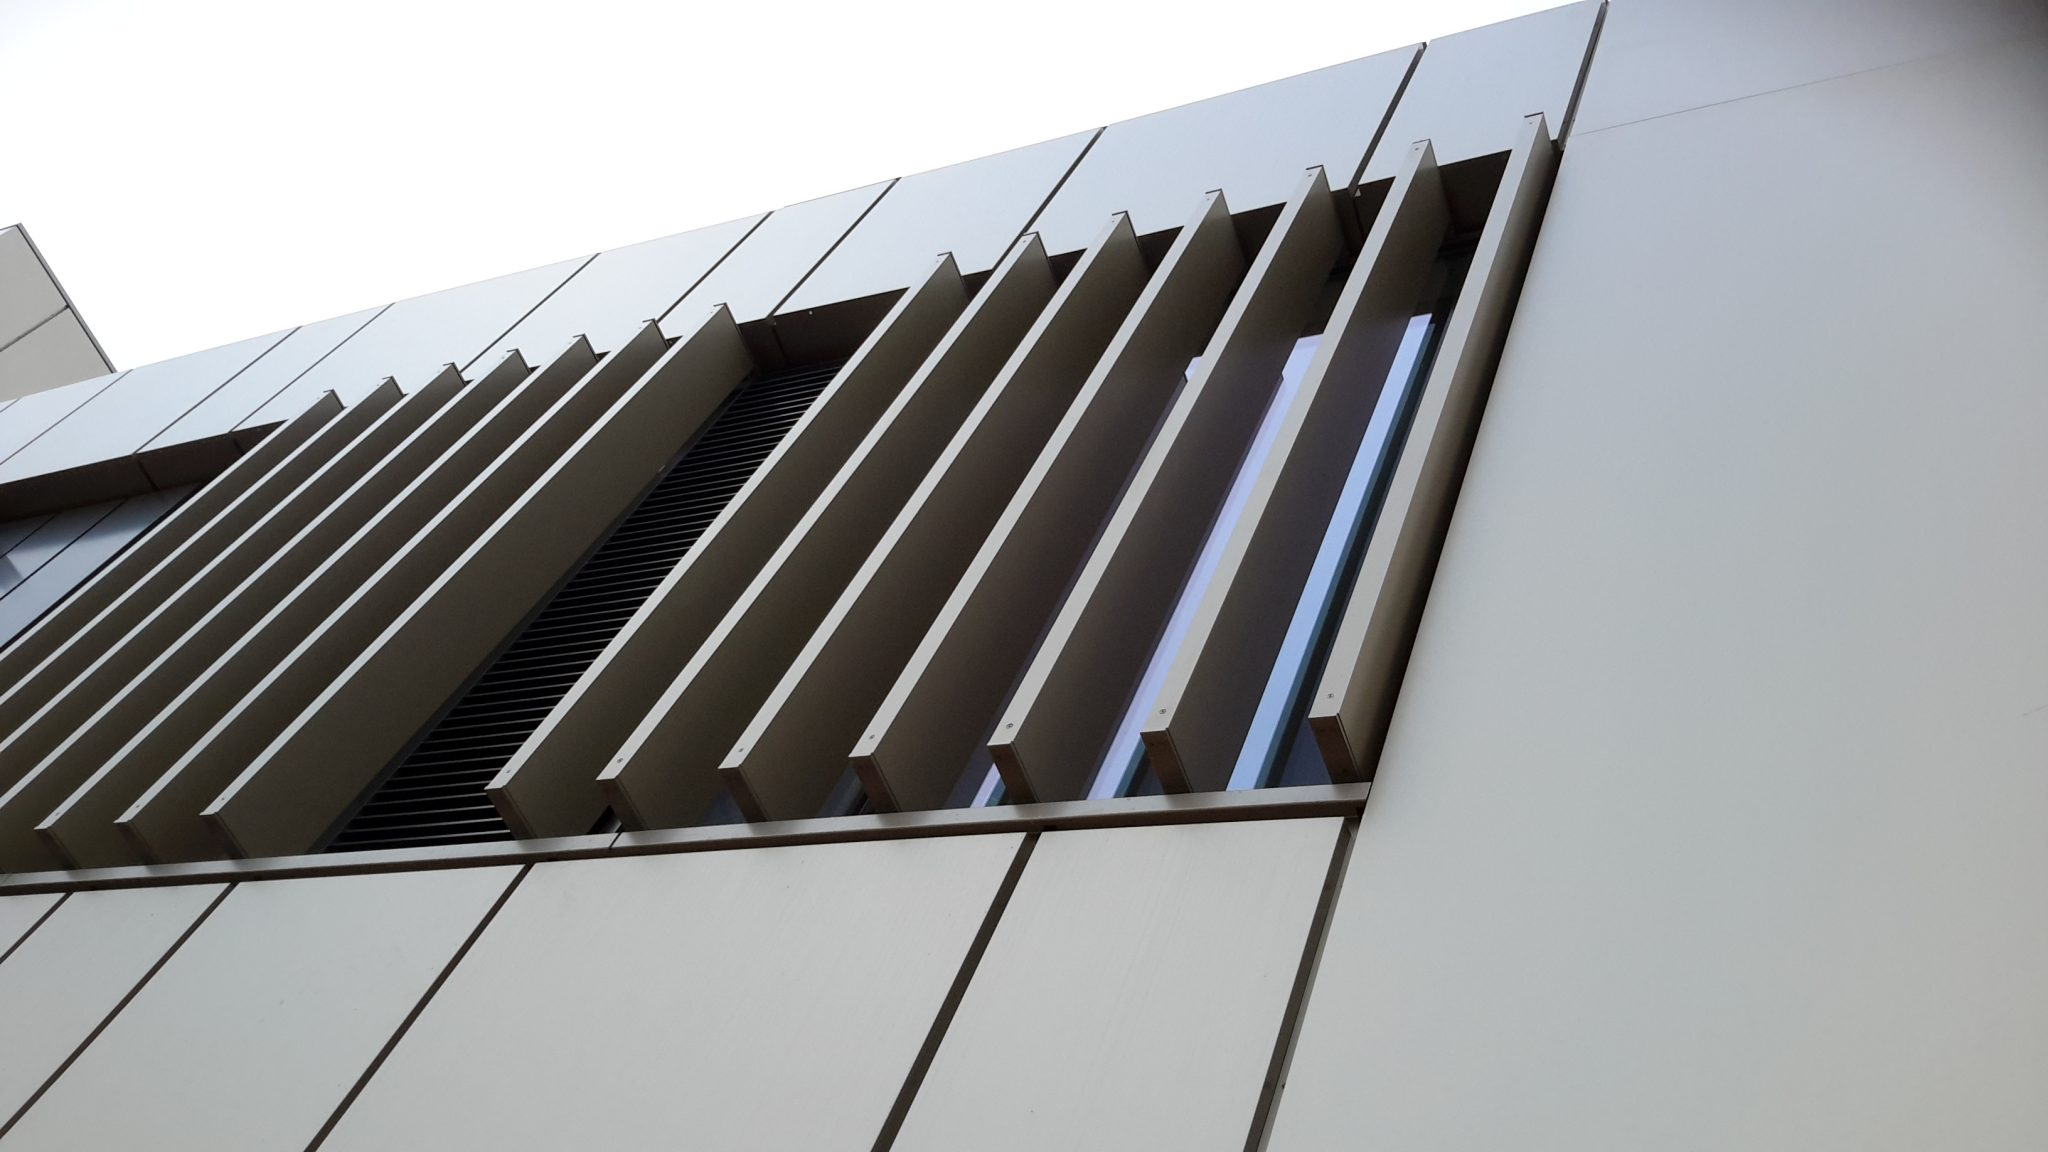 aluminium windows and doors for secondary school. Black Bedroom Furniture Sets. Home Design Ideas